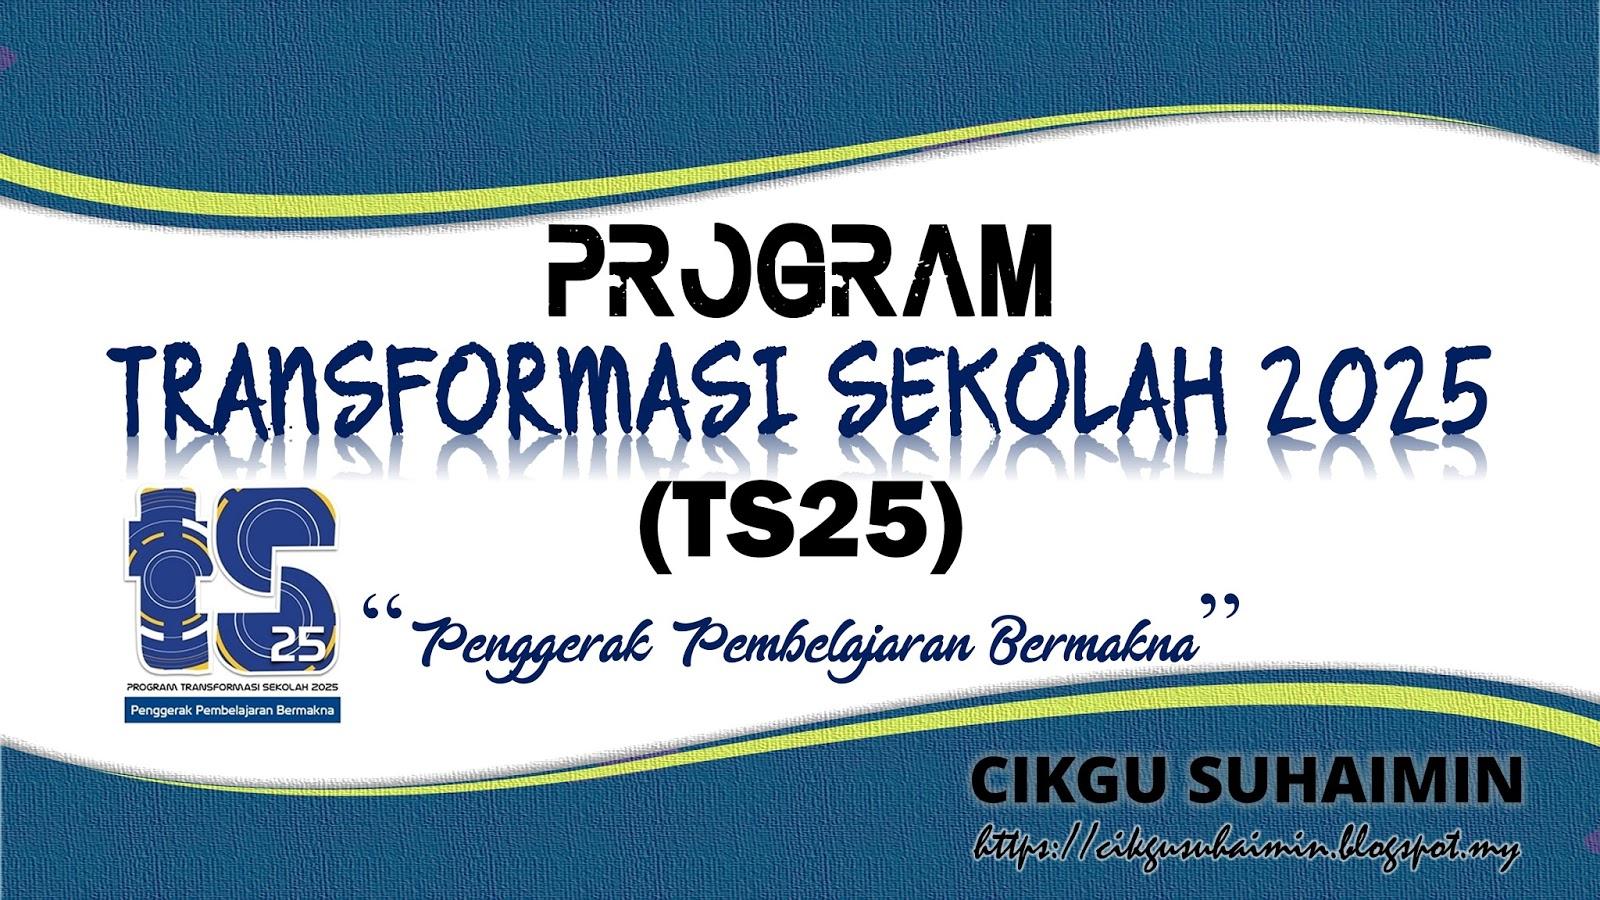 Program Transformasi Sekolah 2025 Ts25